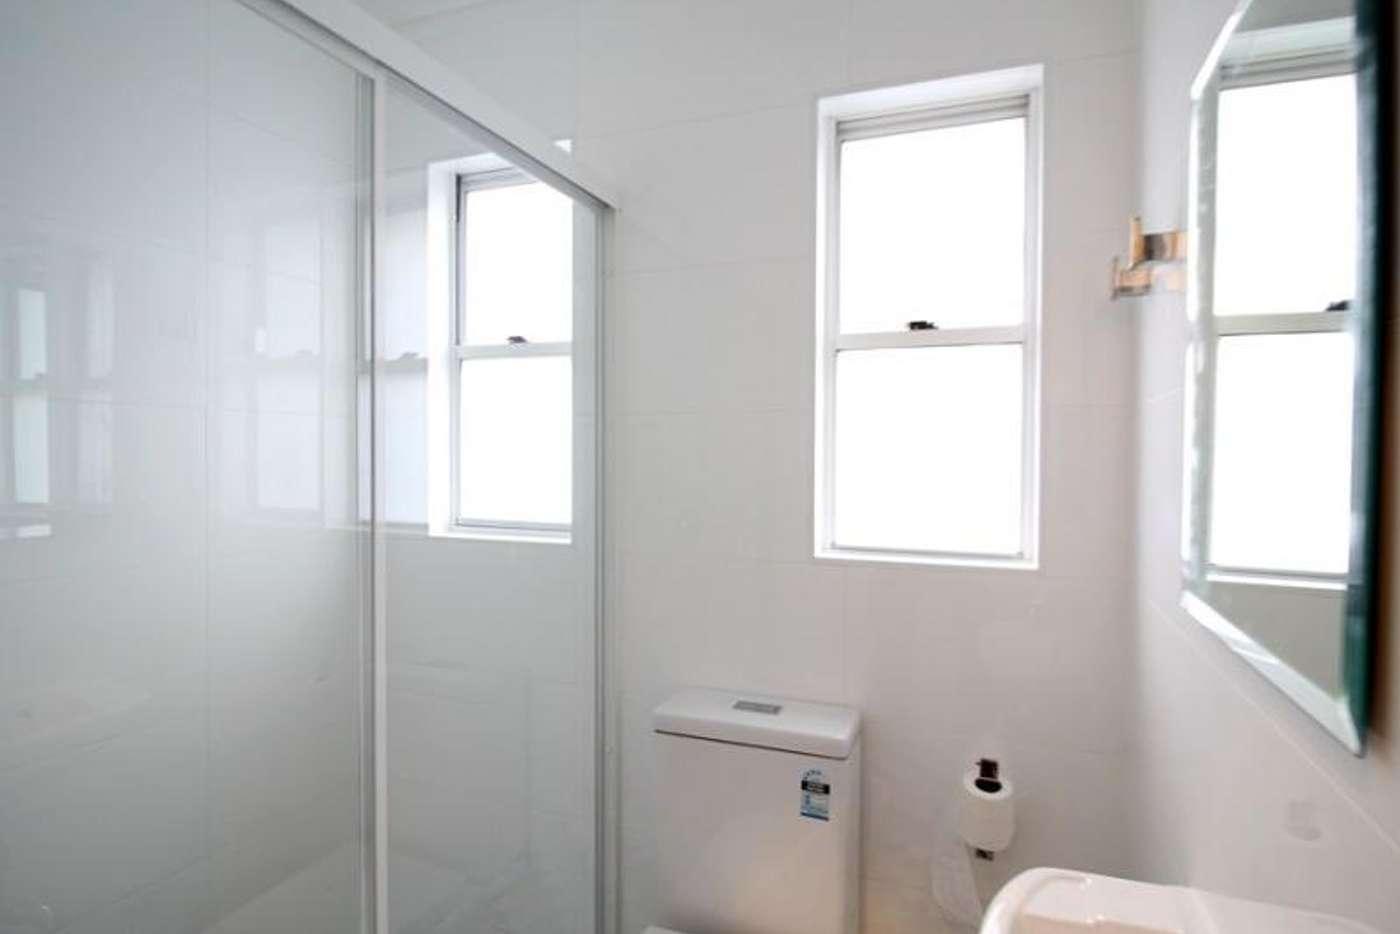 Sixth view of Homely studio listing, 345 Bourke Street, Darlinghurst NSW 2010